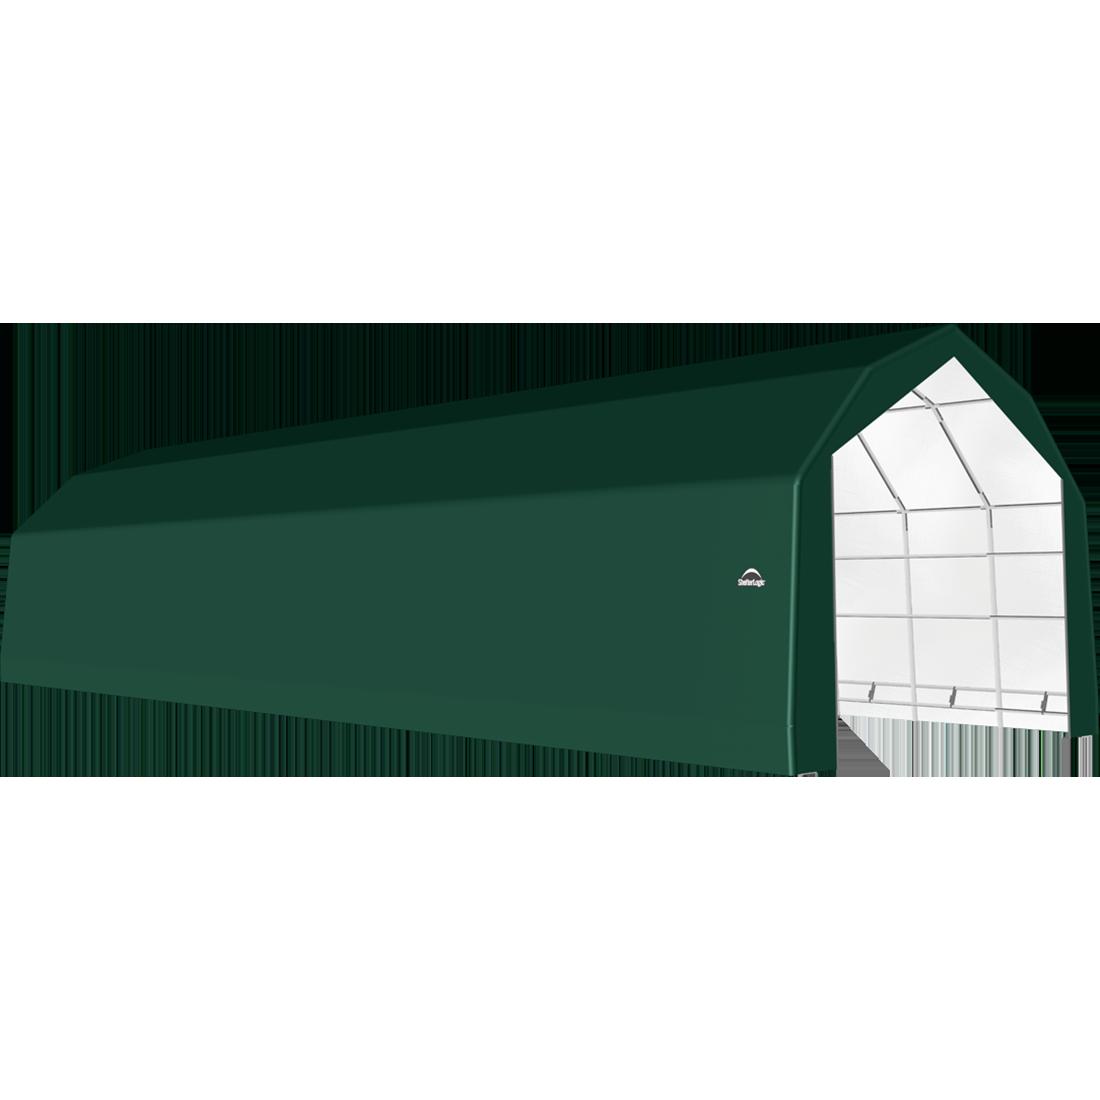 SP Barn 20X64X15 Green 14 oz PE Shelter